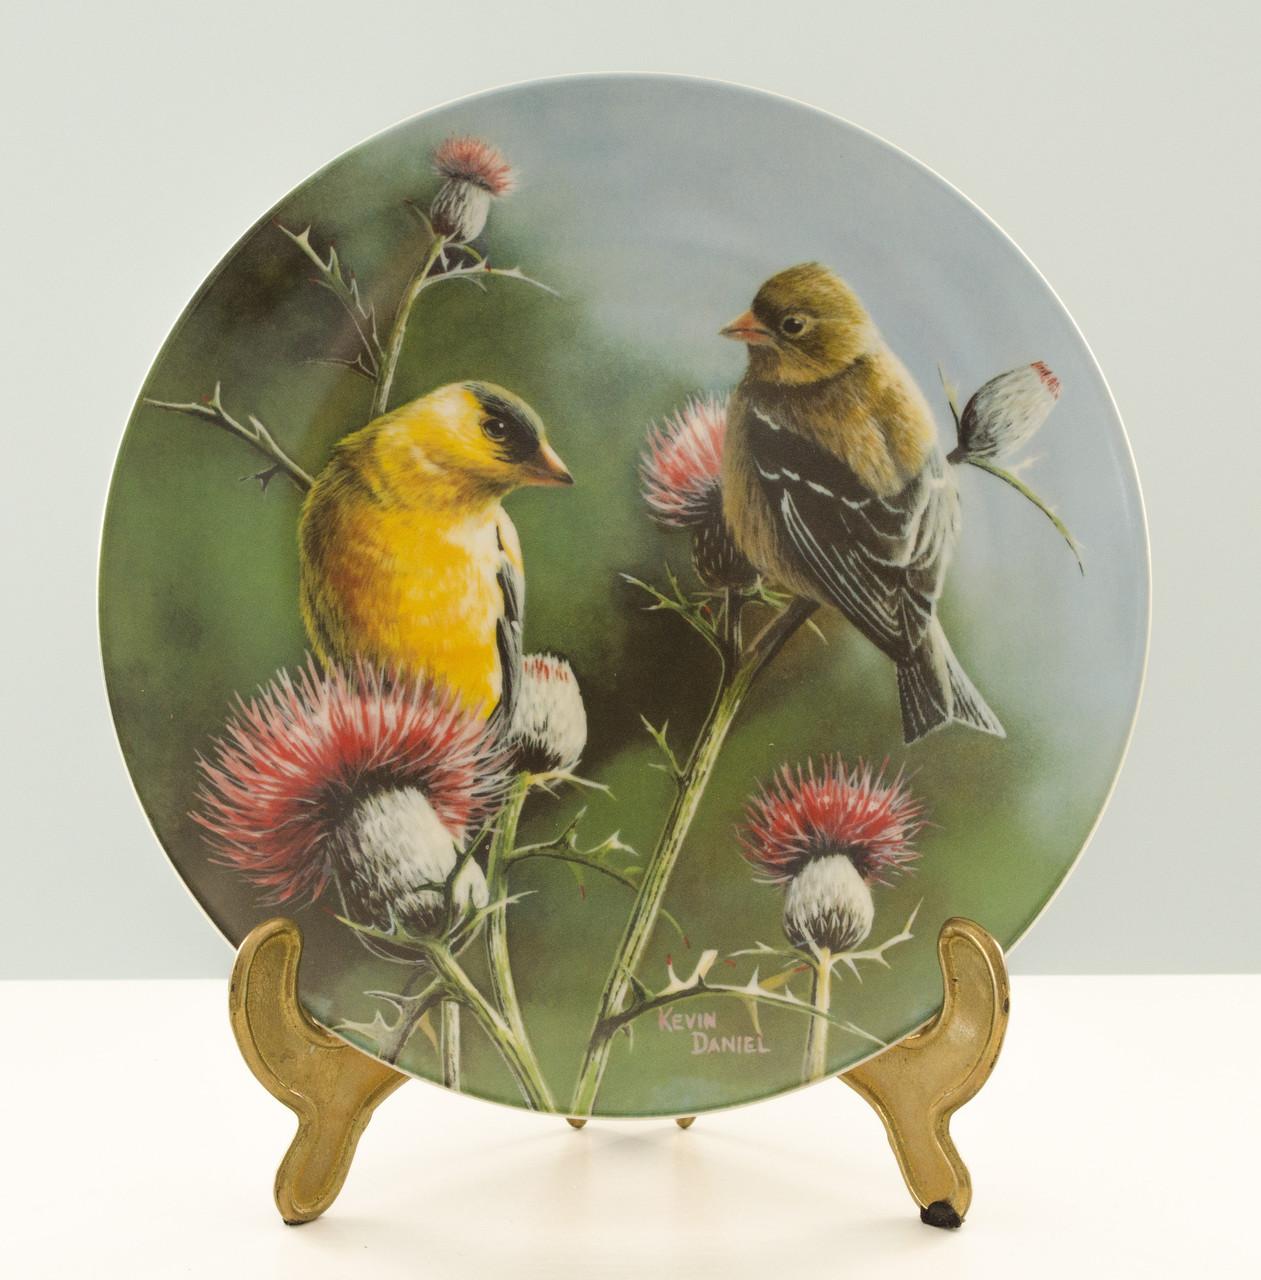 Коллекционная фарфоровая тарелка, фарфор, The goldfinch, Knowles, Англия, 1987 год